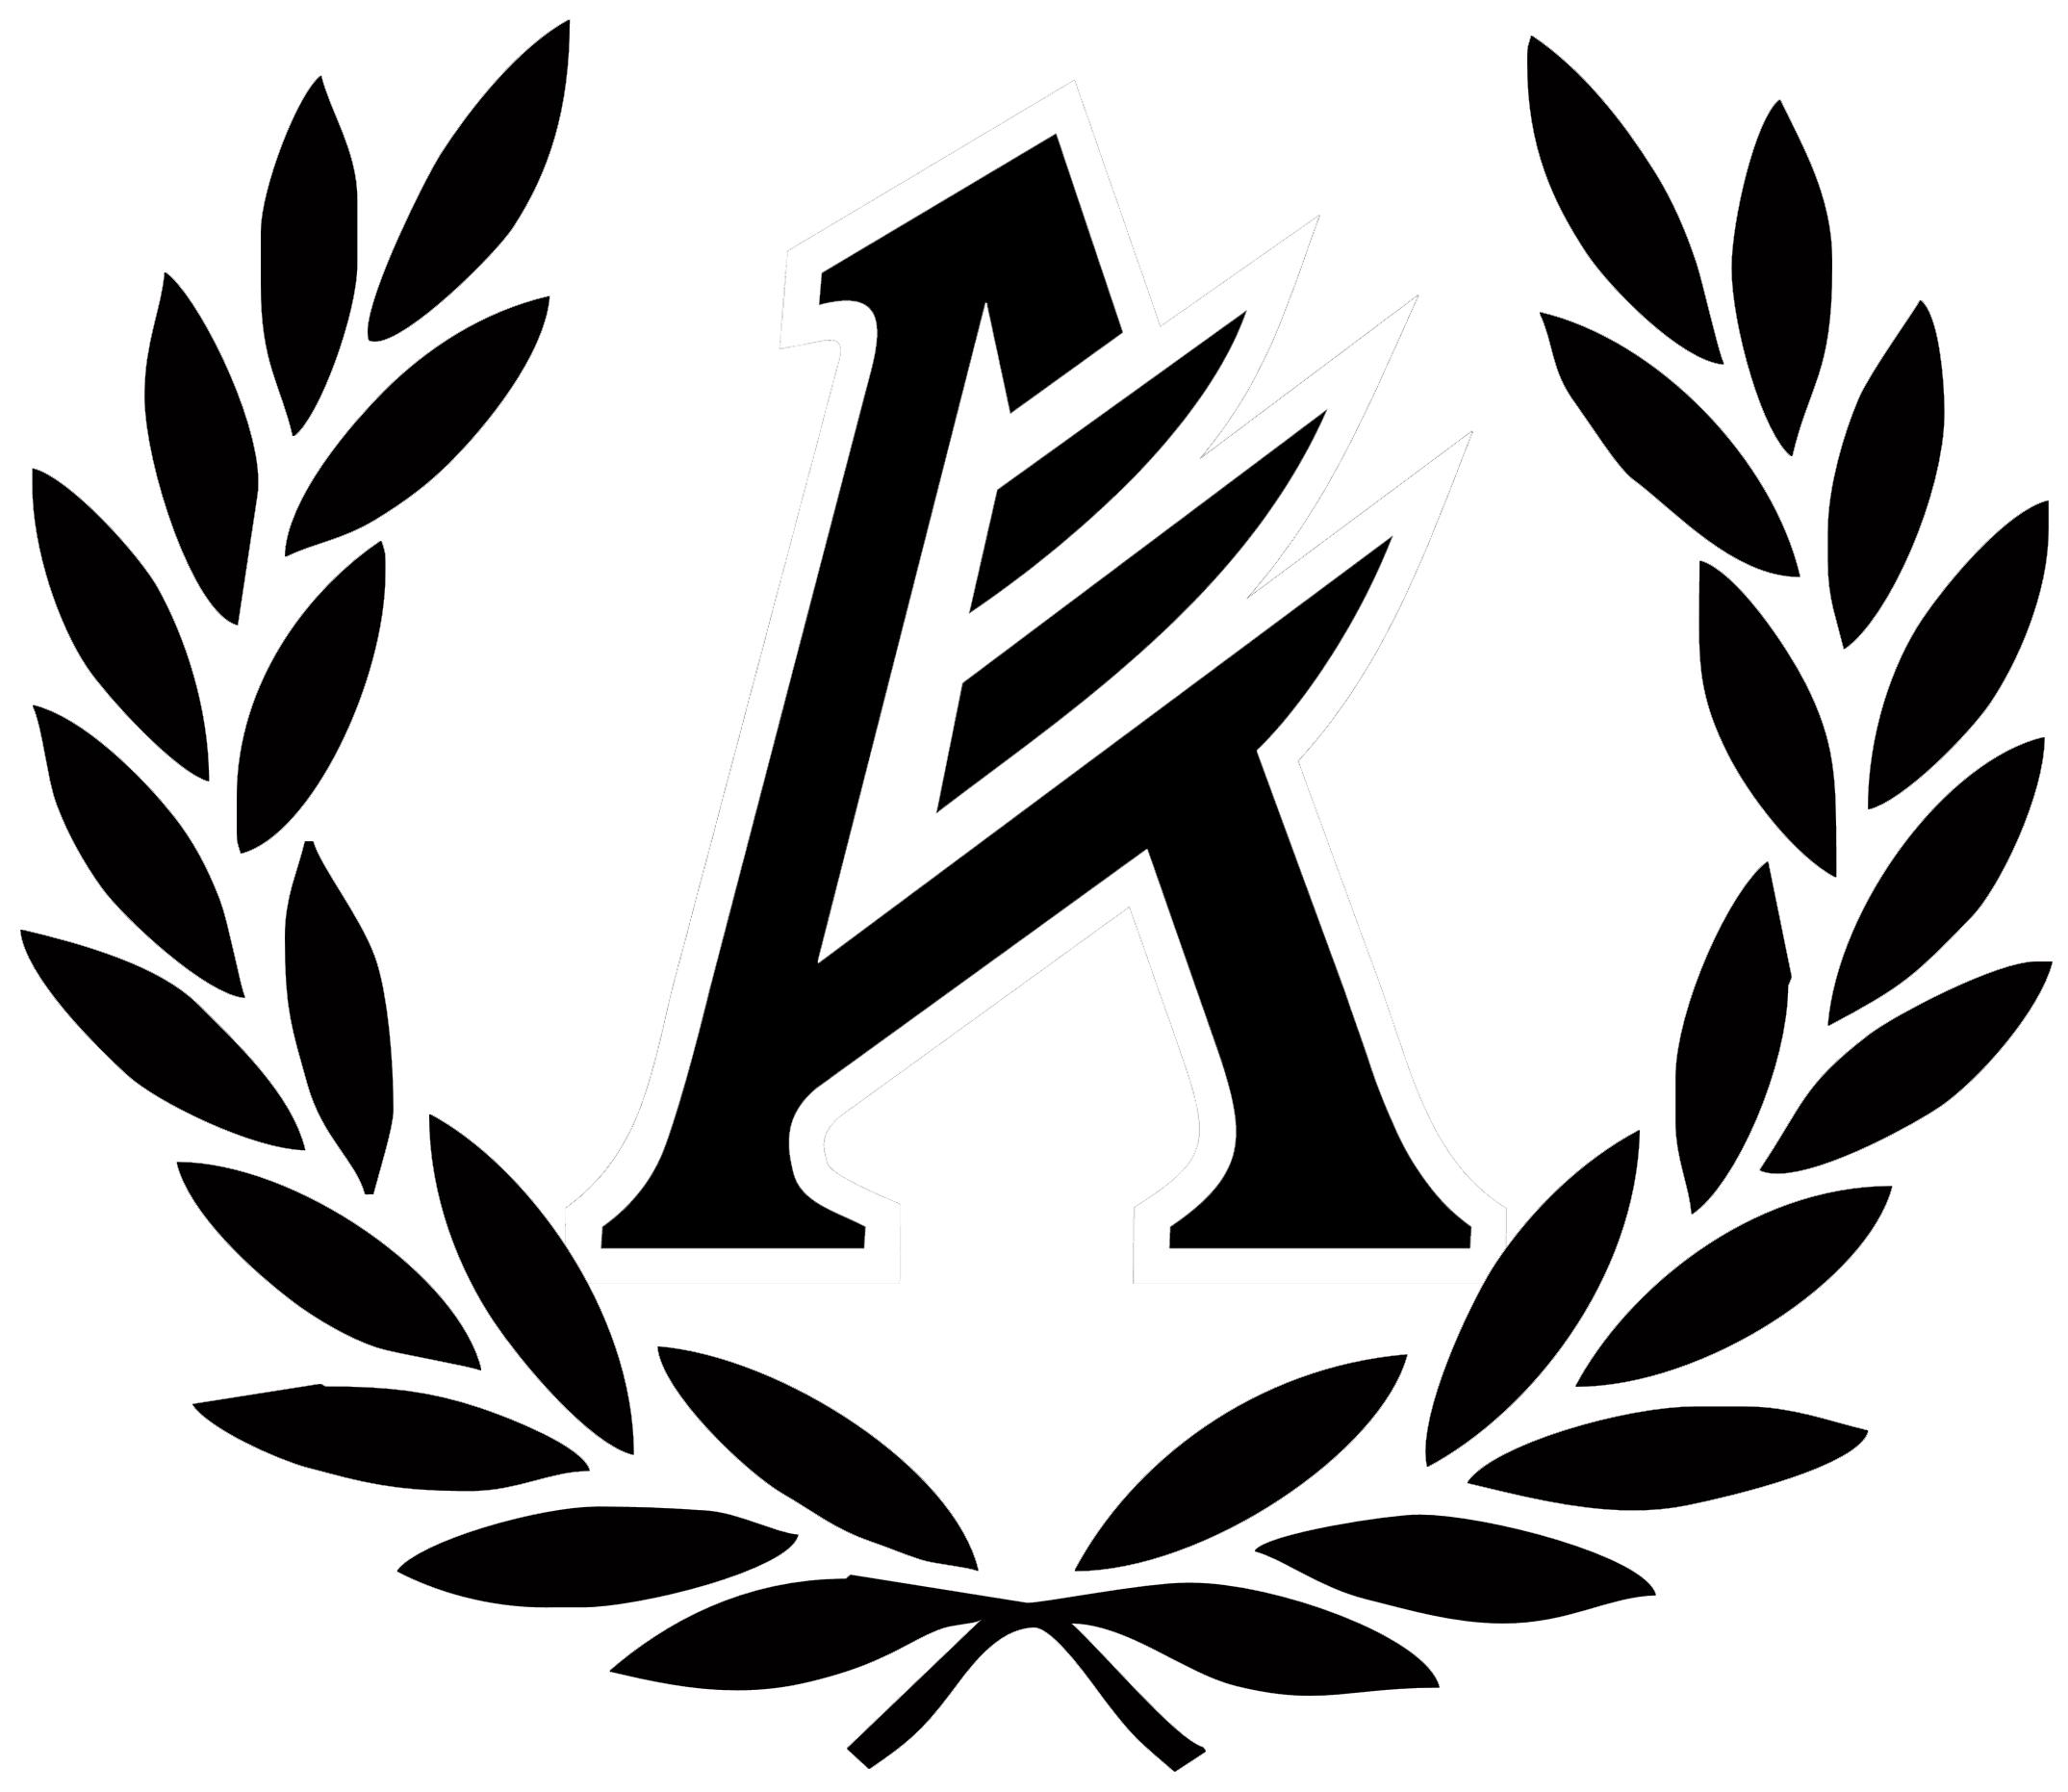 Logo clipart picture download logo clip art free download – Clipart Free Download picture download